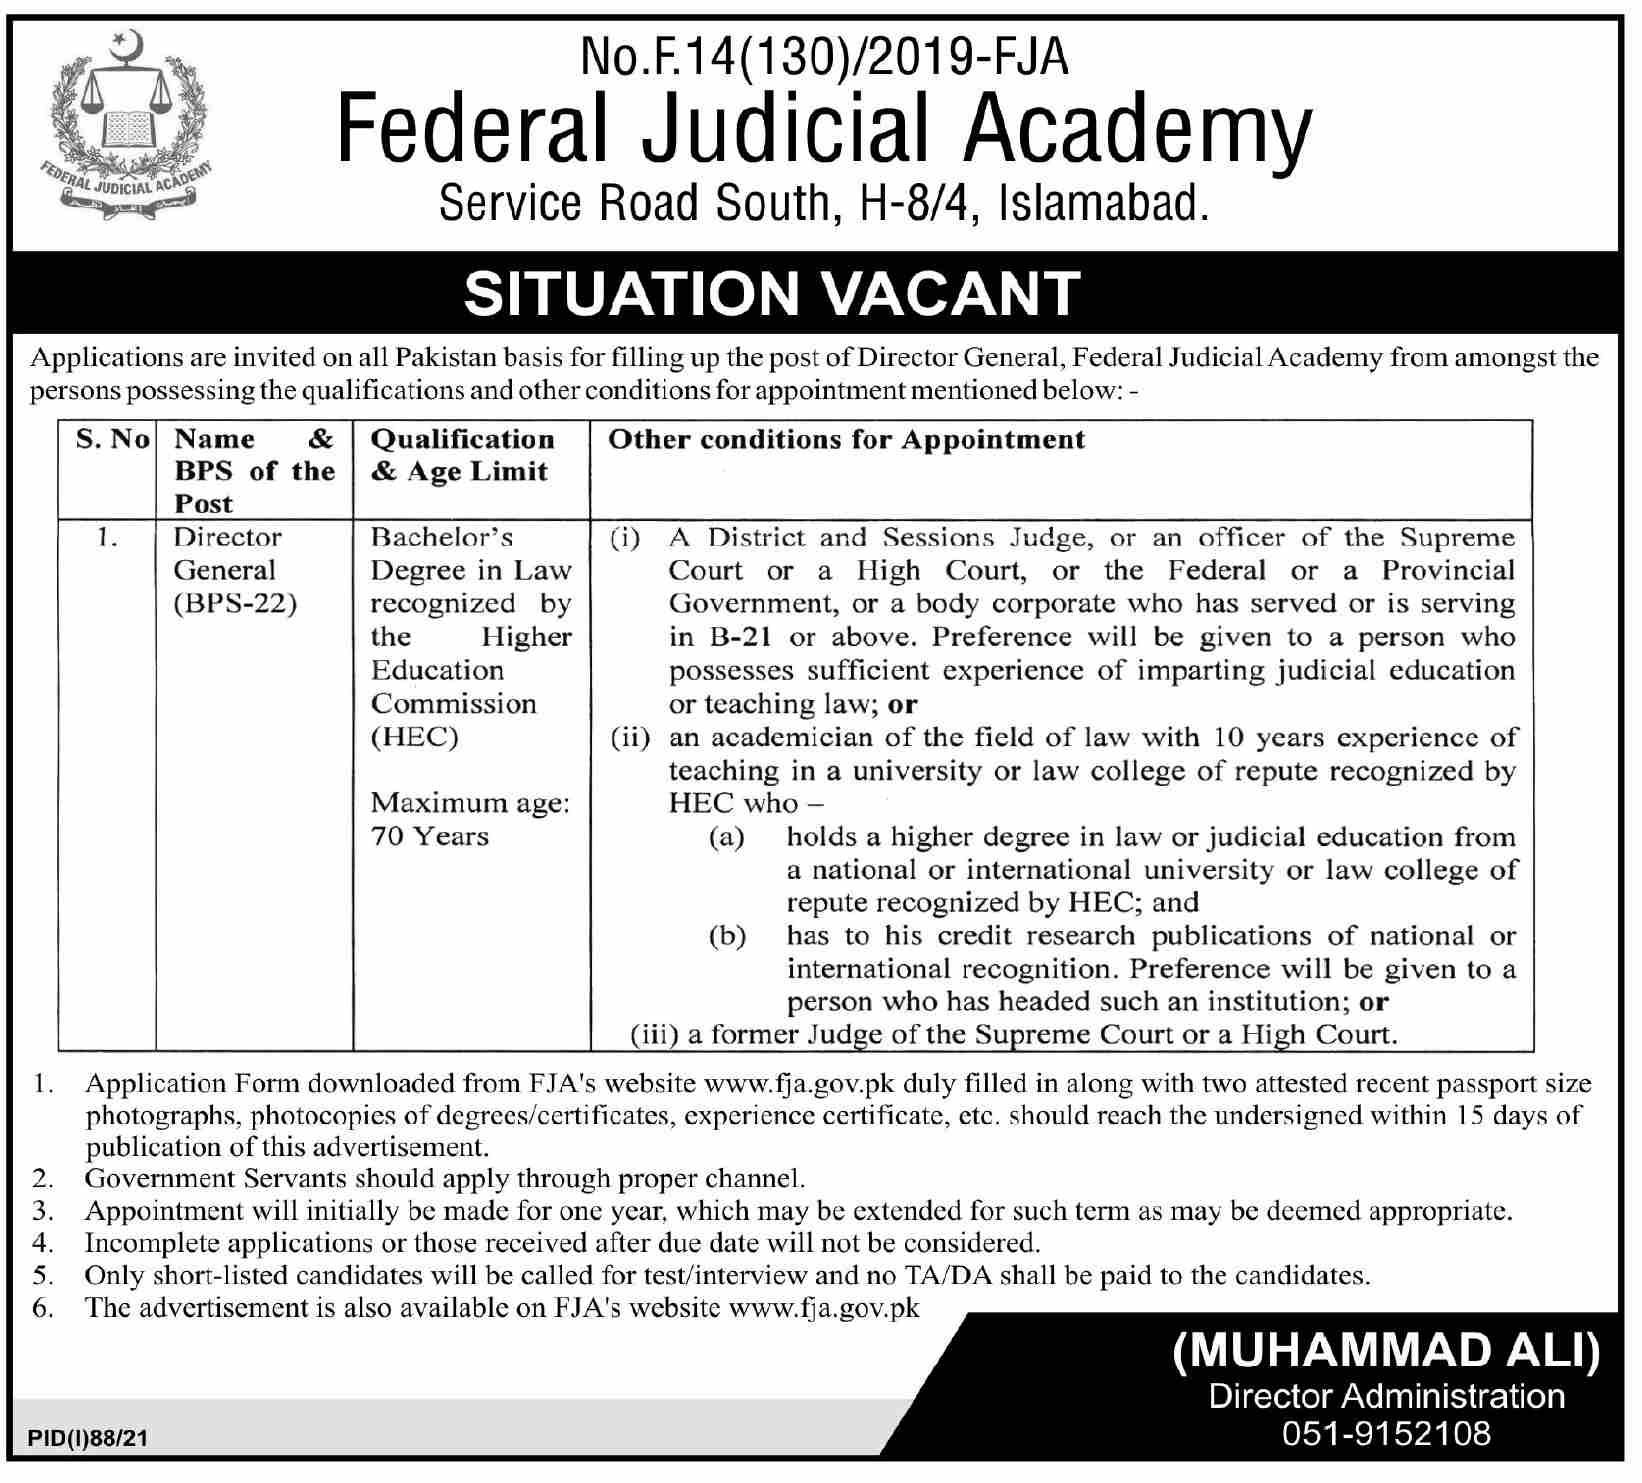 Director General Jobs in Federal Judicial Academy